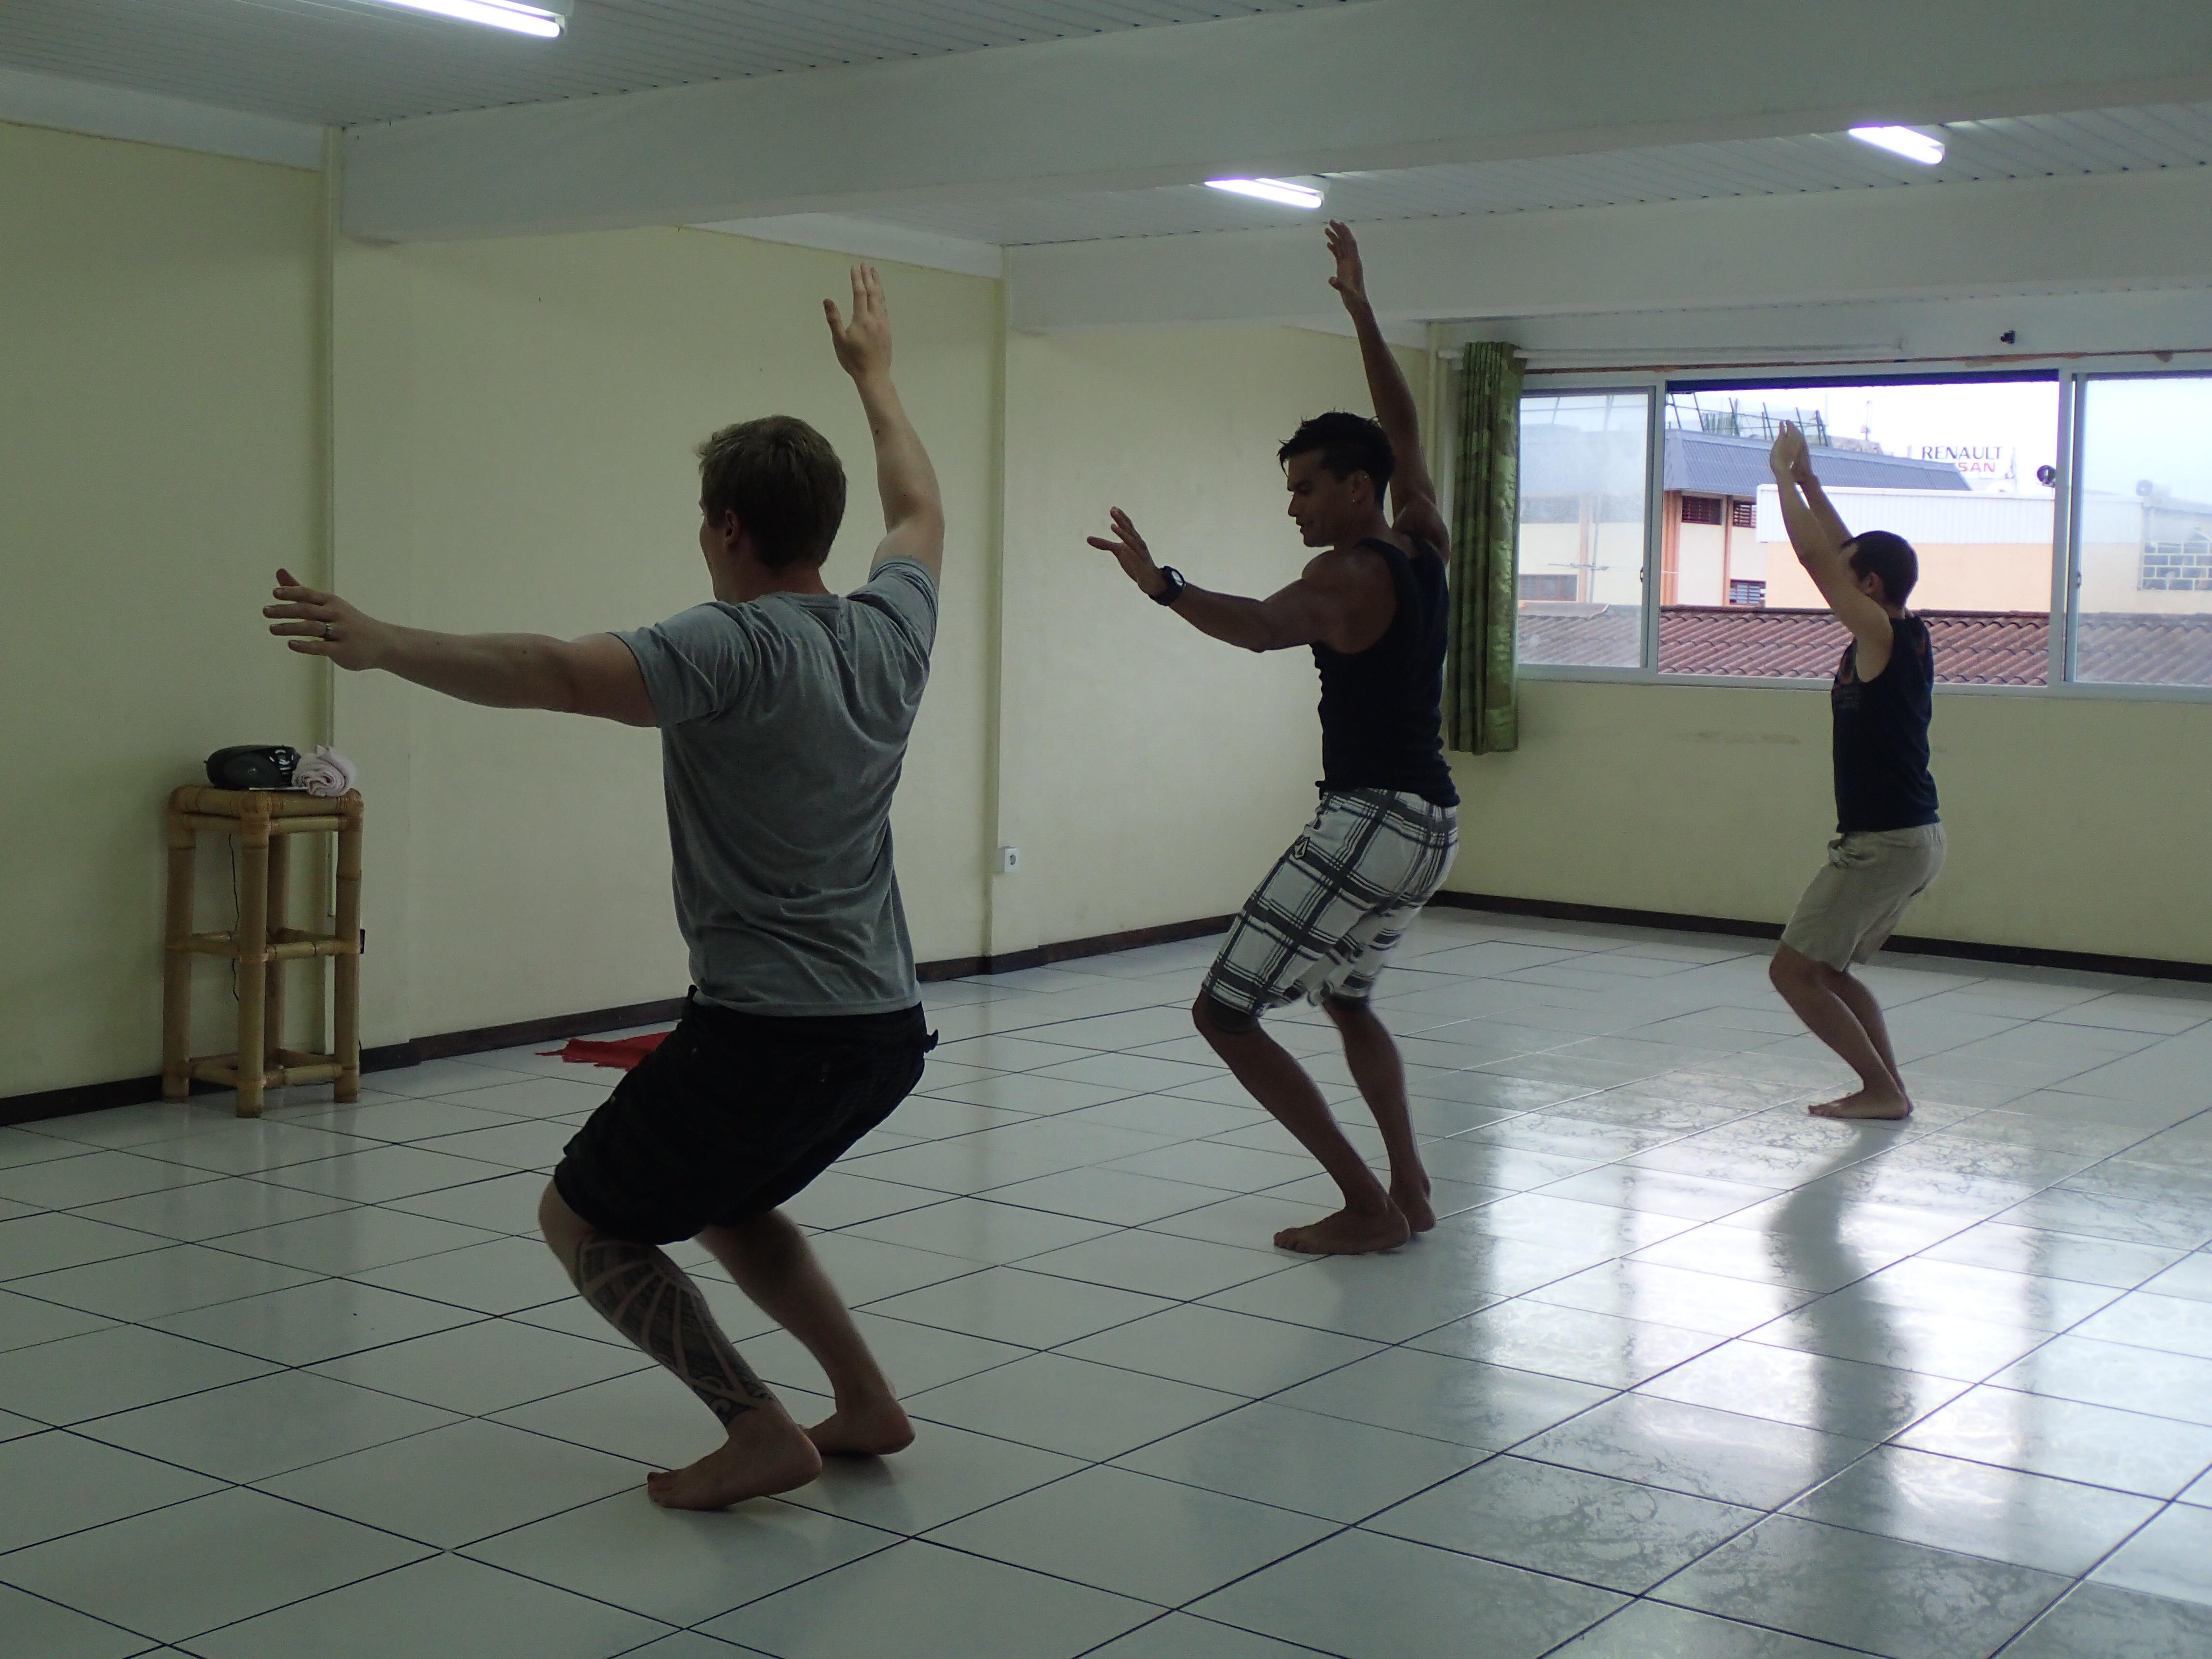 Antin ekat tanssitreenit